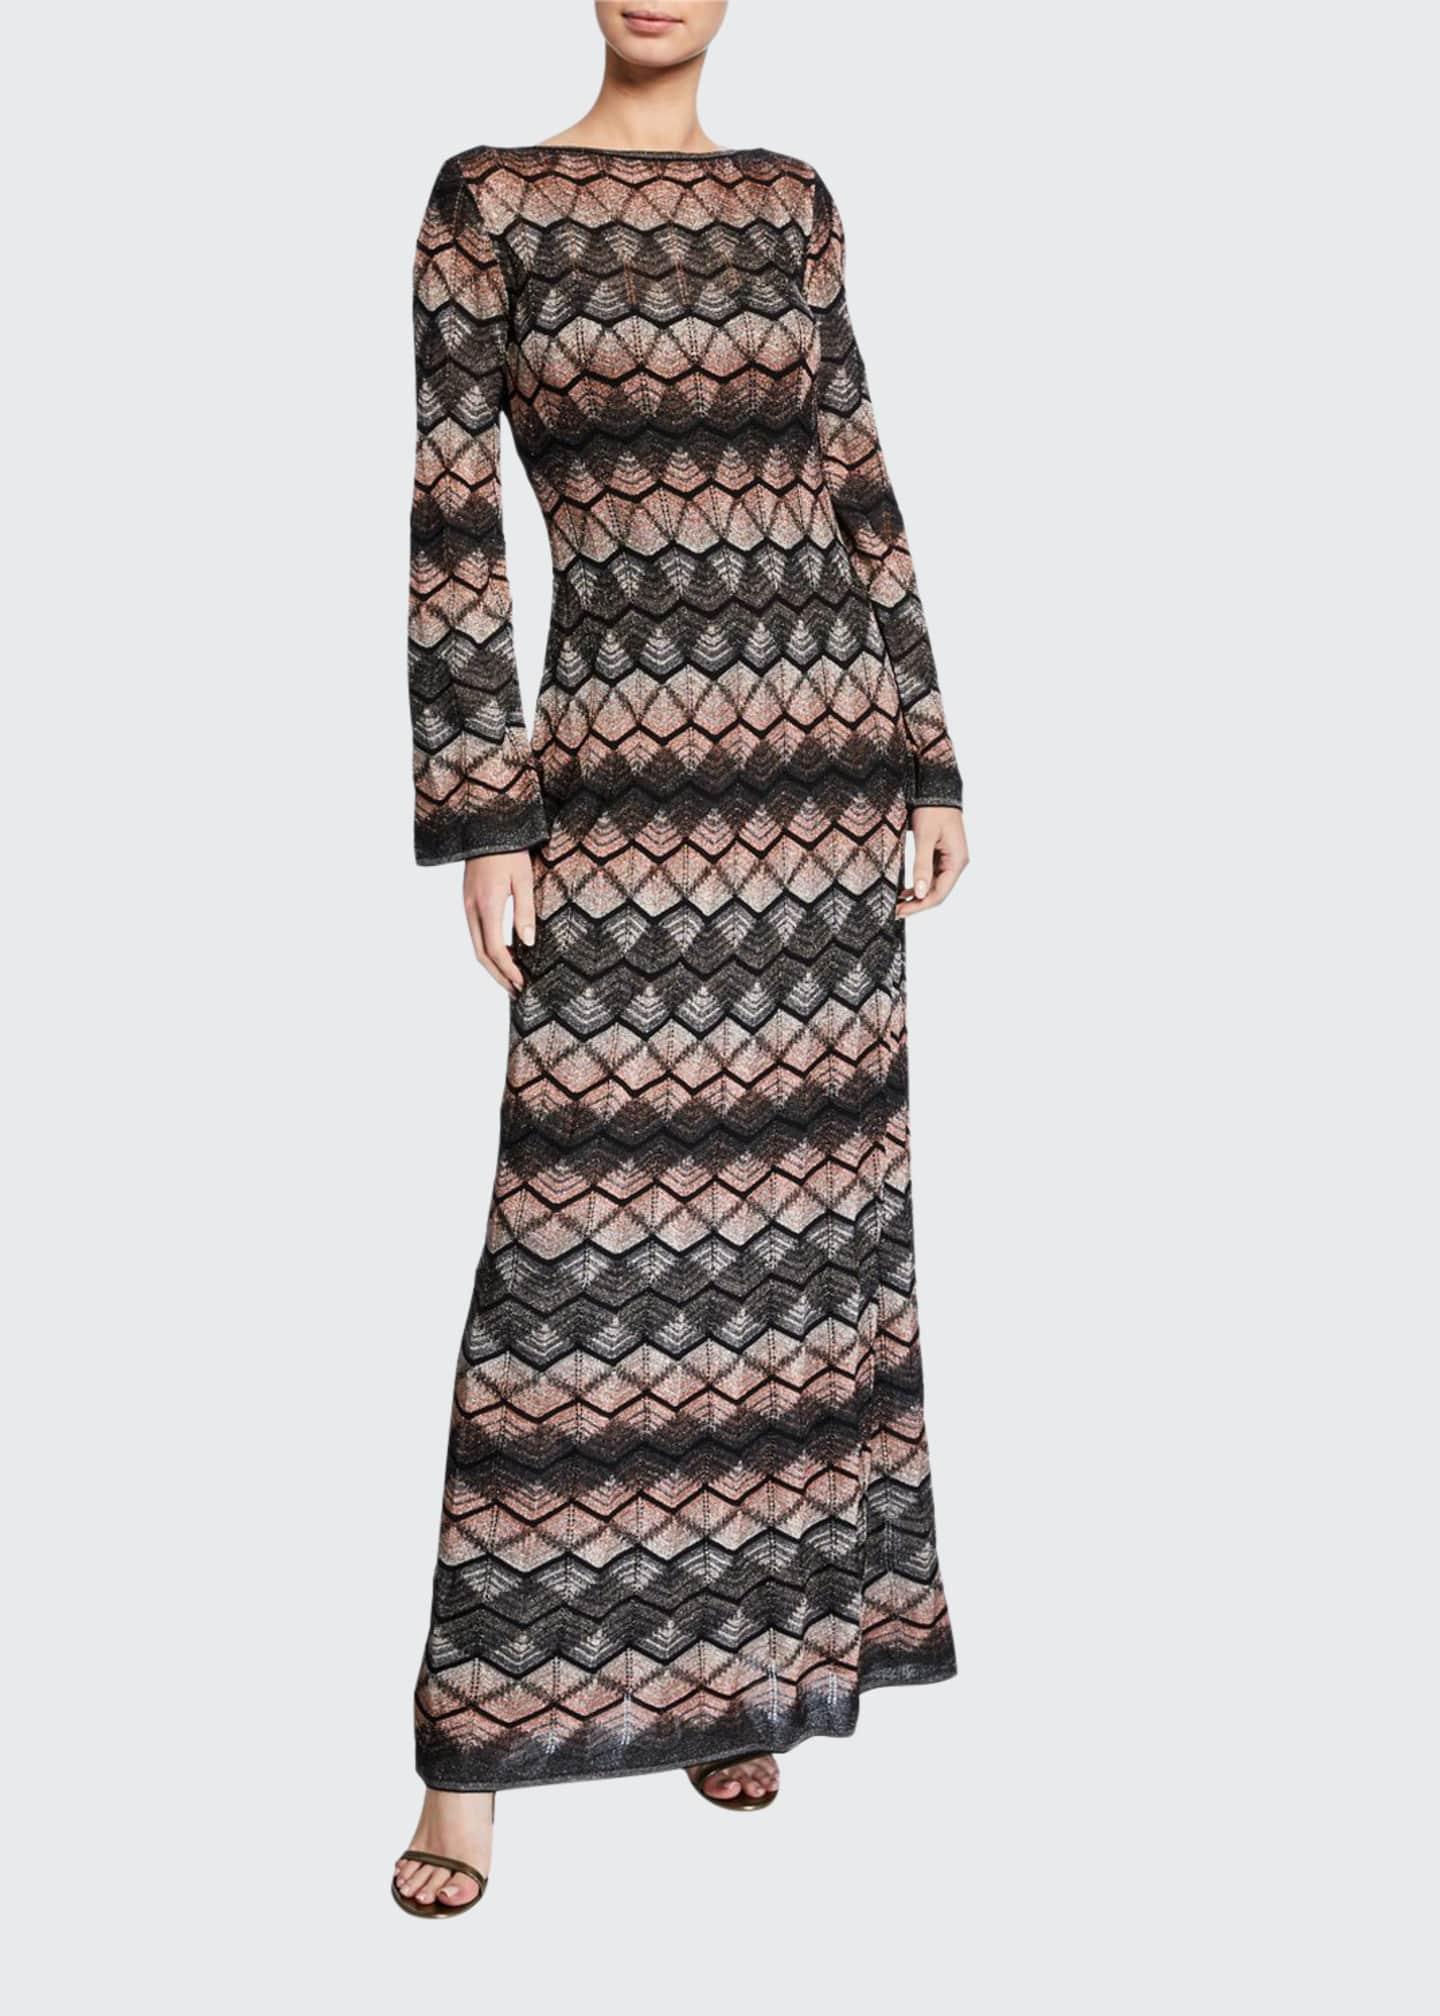 M Missoni Zigzag Long-Sleeve Scoop-Back Long Dress